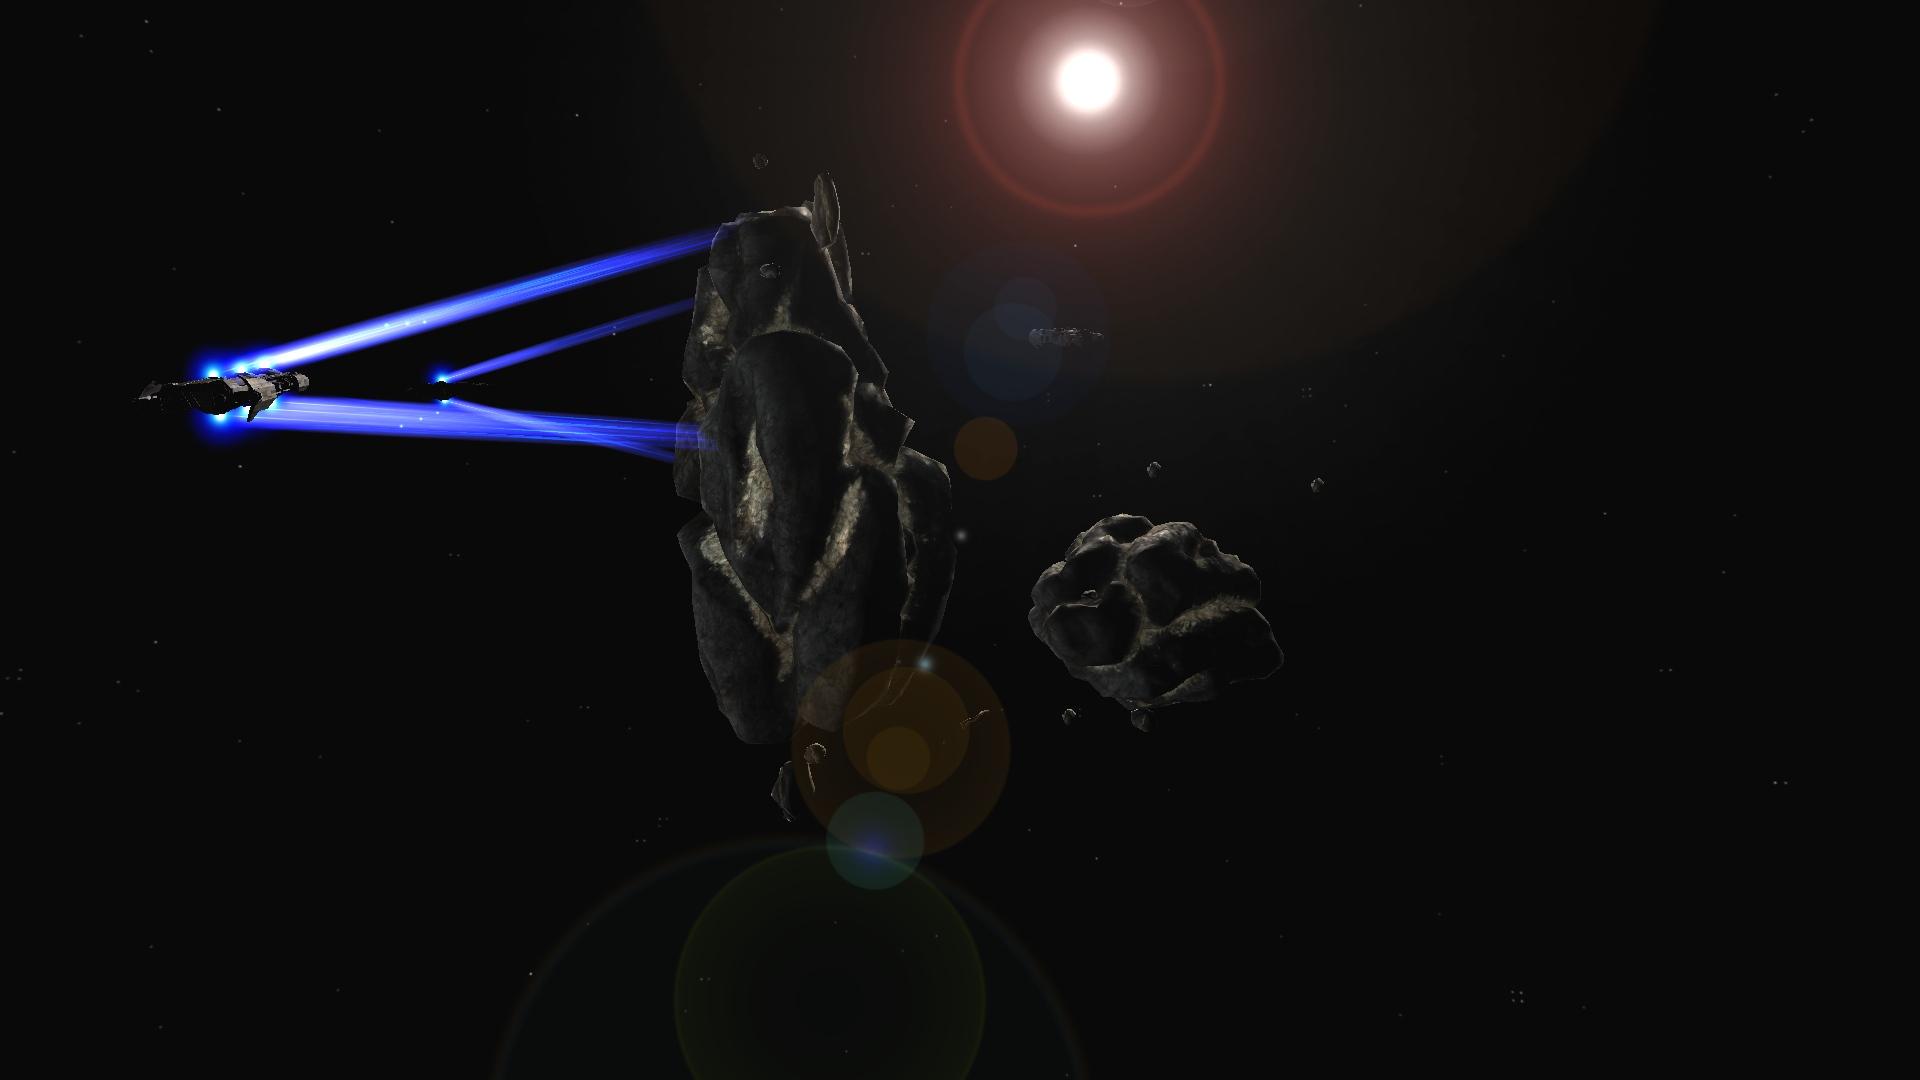 ice comet asteroids - photo #29